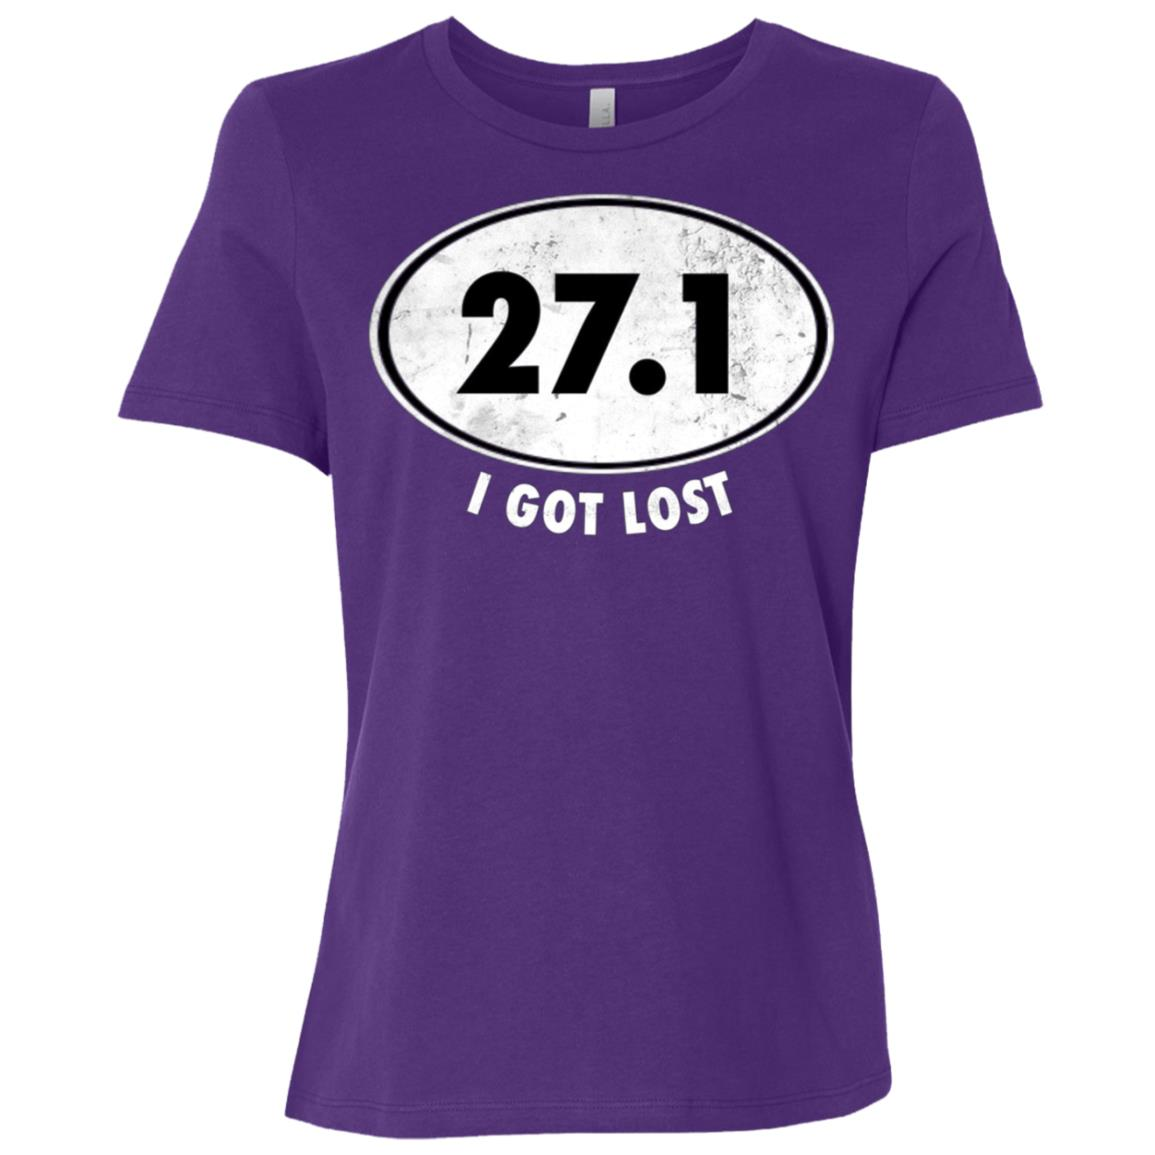 27.1 I Got Lost Funny Marathon Runner Tee Women Short Sleeve T-Shirt